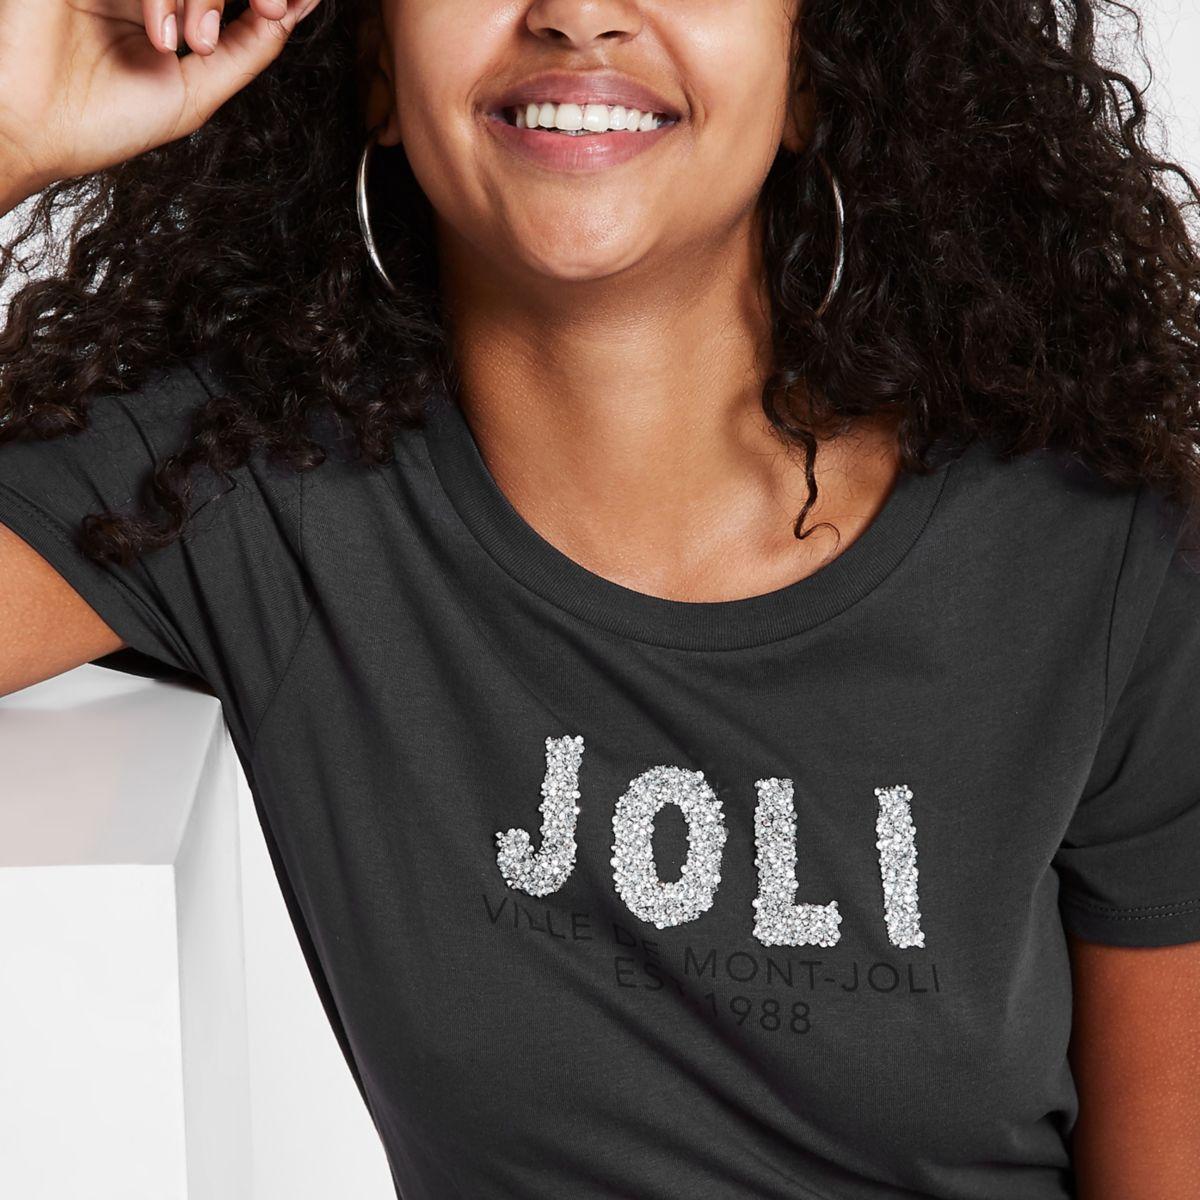 Dark grey 'Joli' rhinestone embellished T-shirt